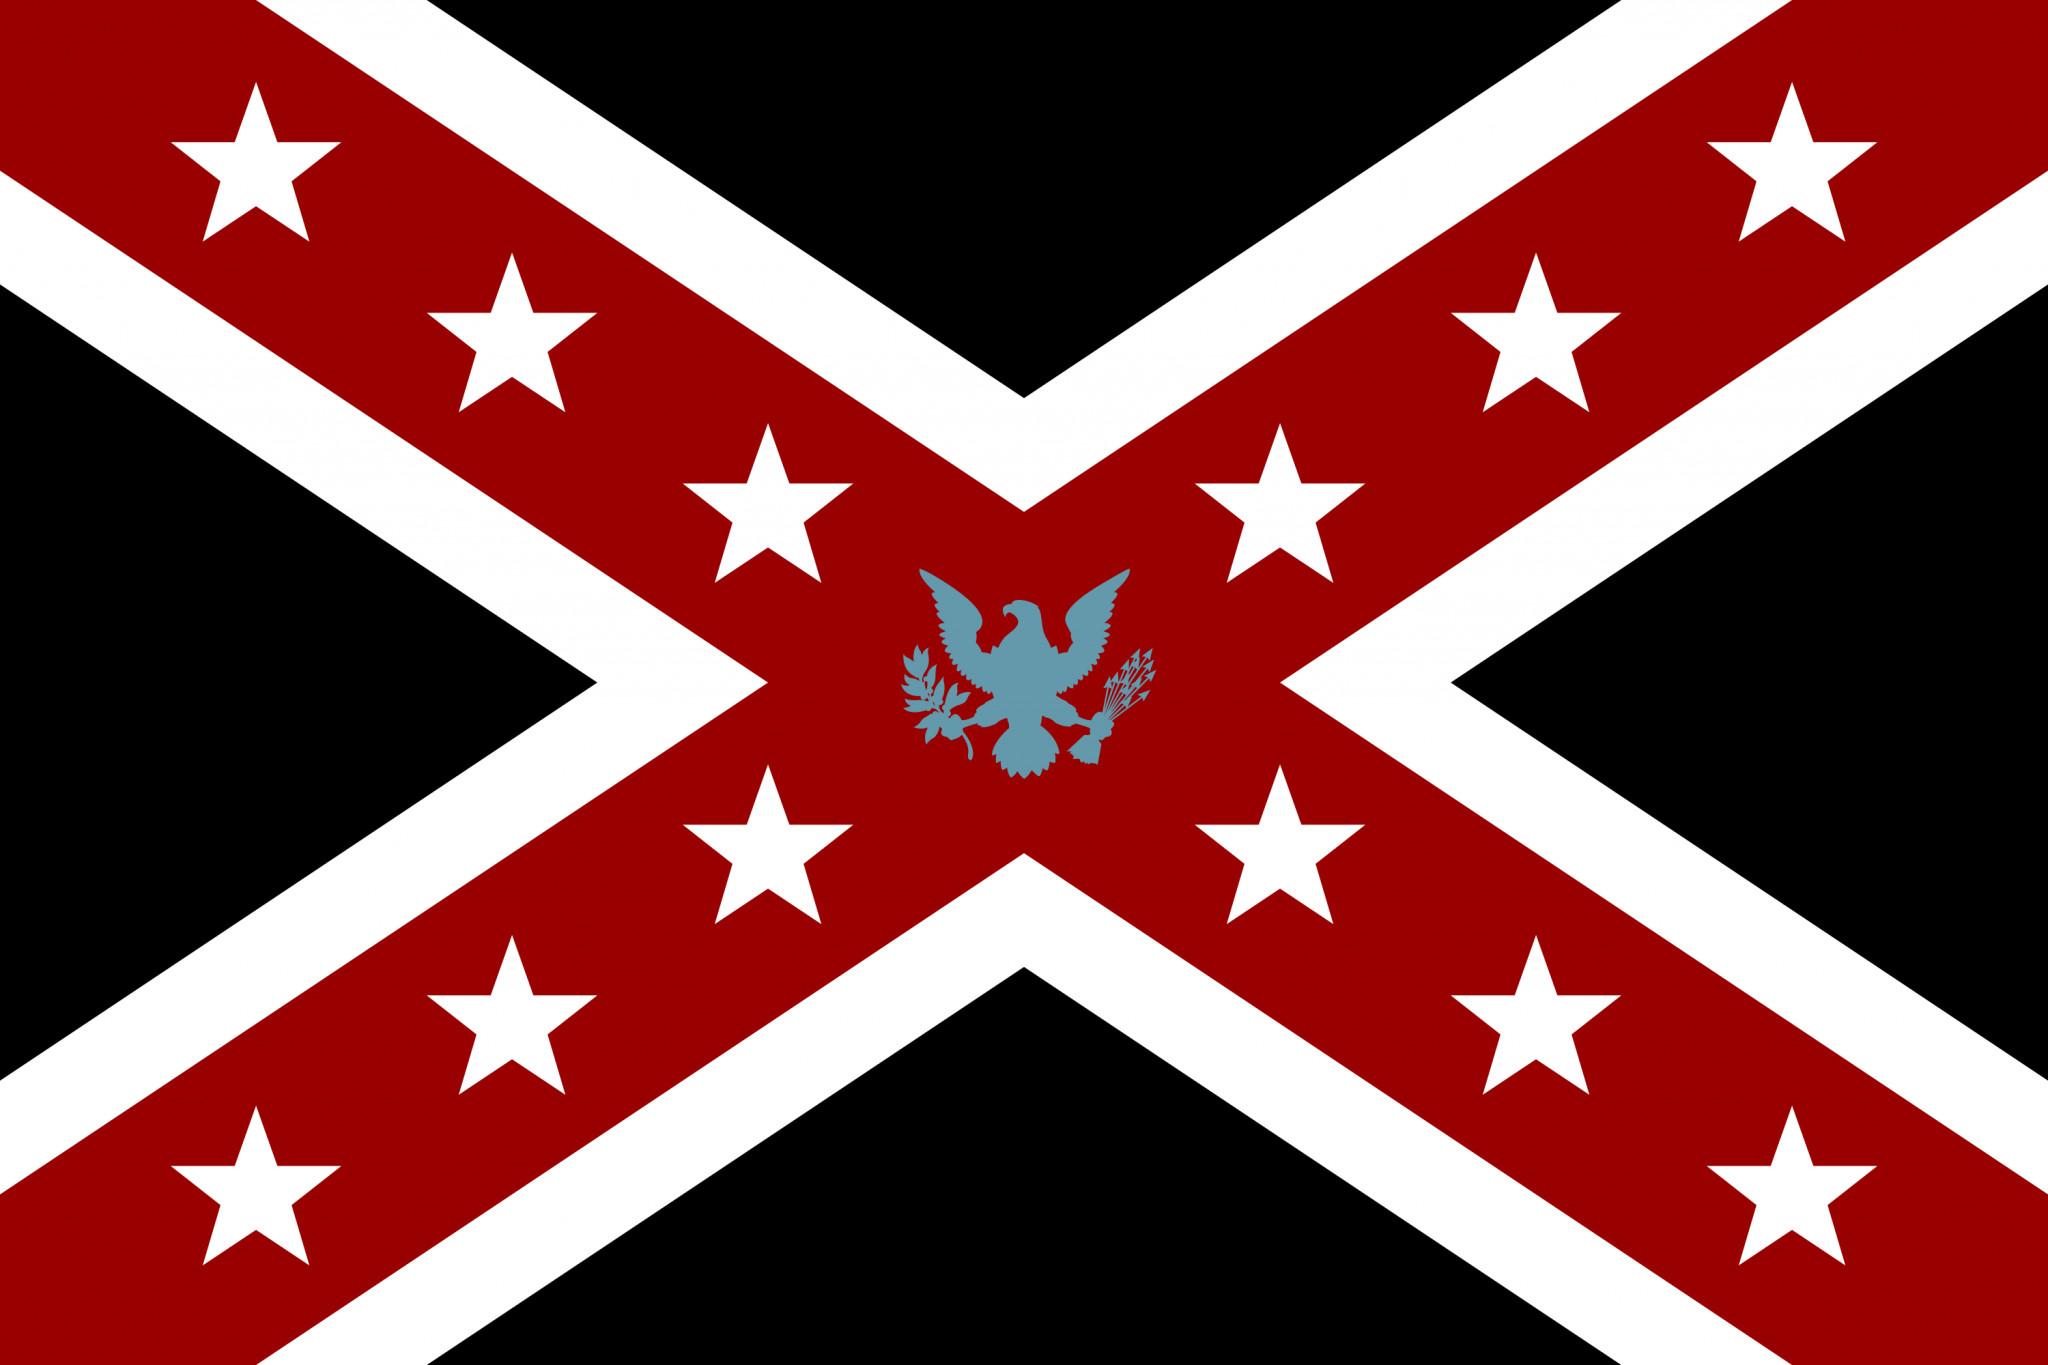 confederate flag hd widescreen wallpapers for desktop